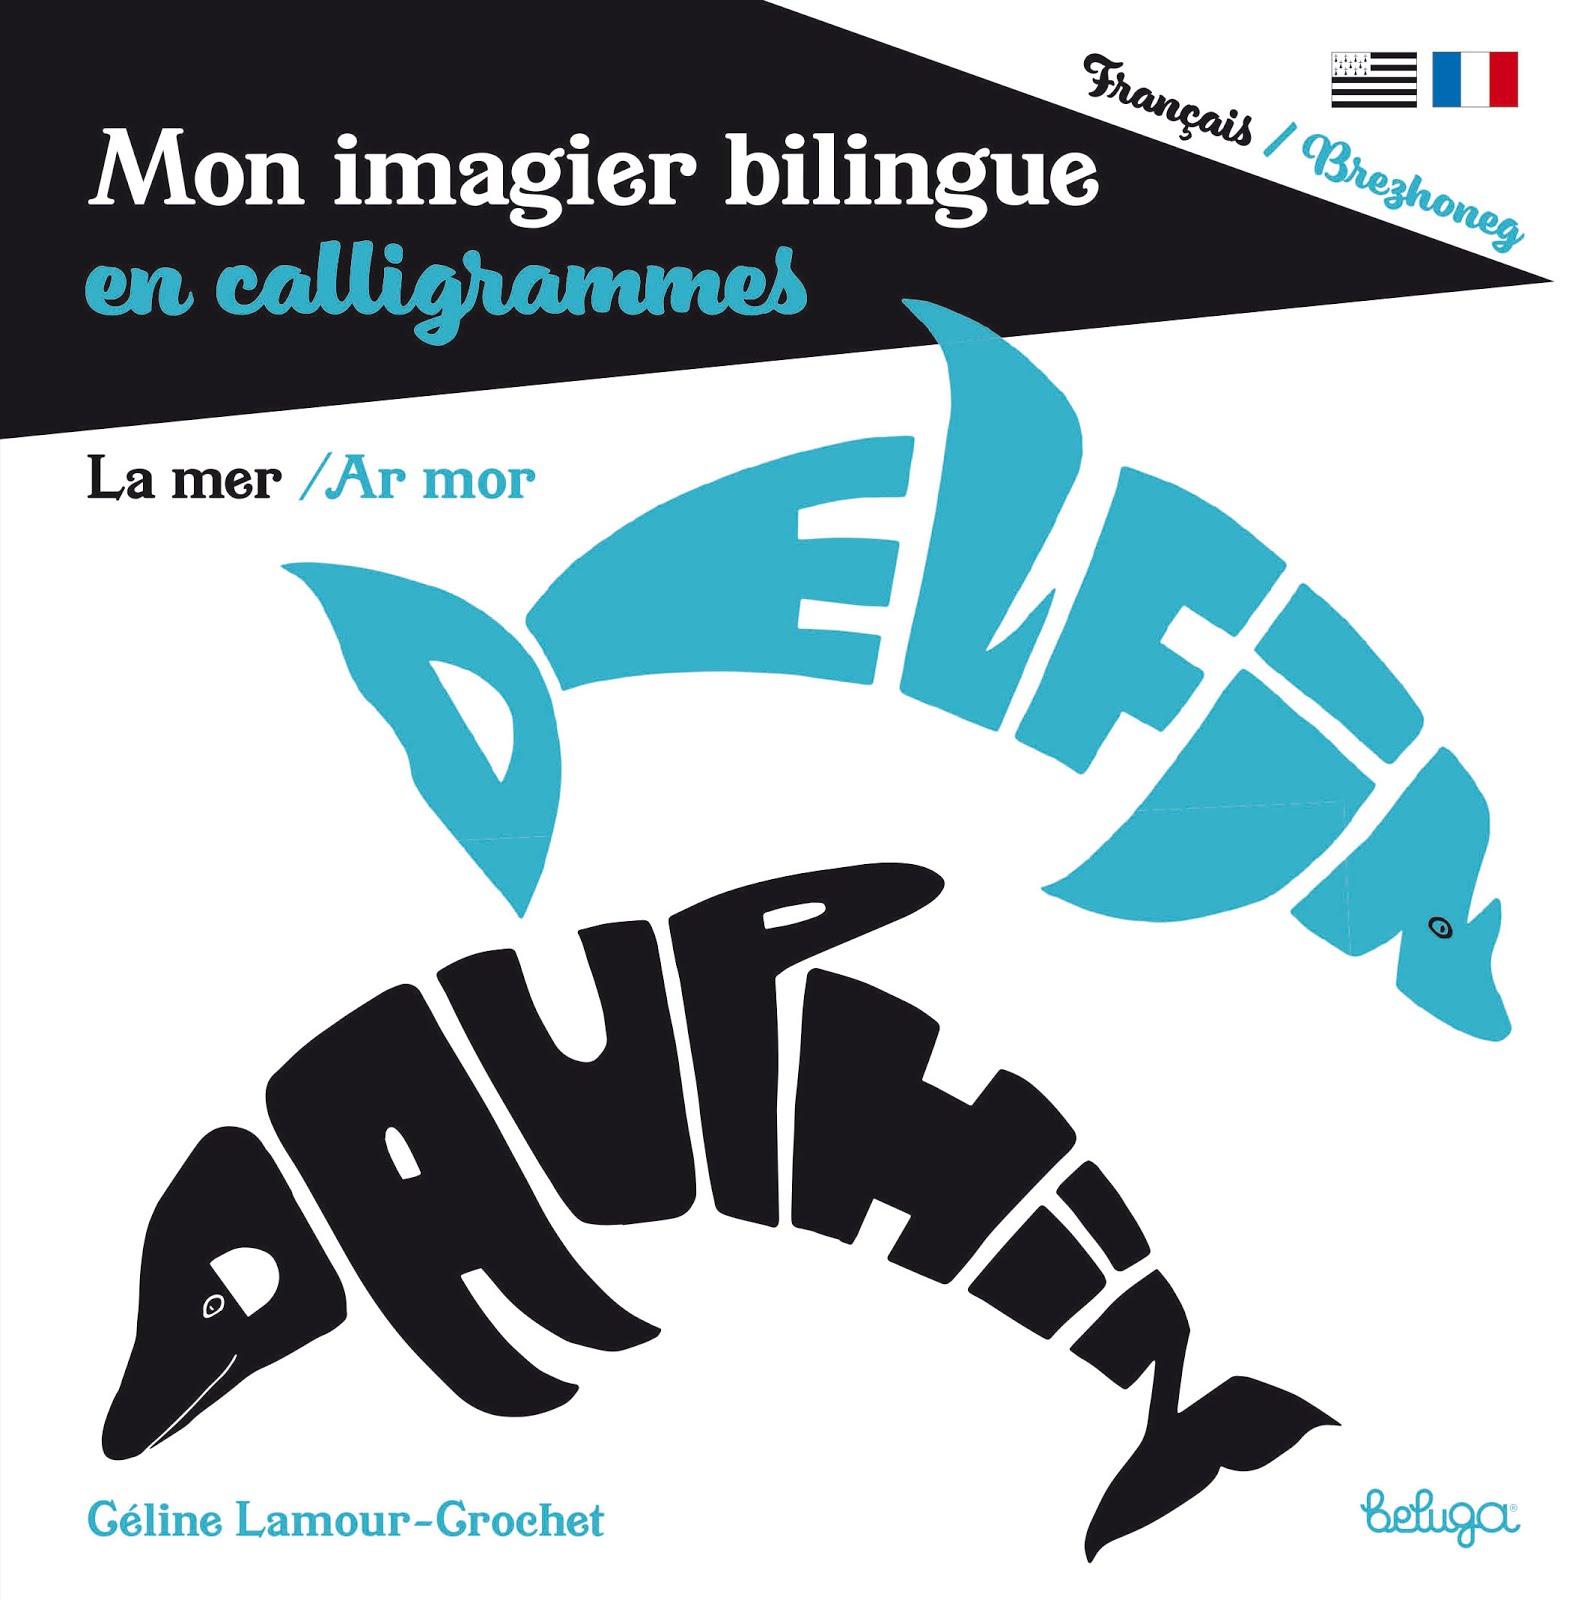 Mon imagier bilingue de la mer